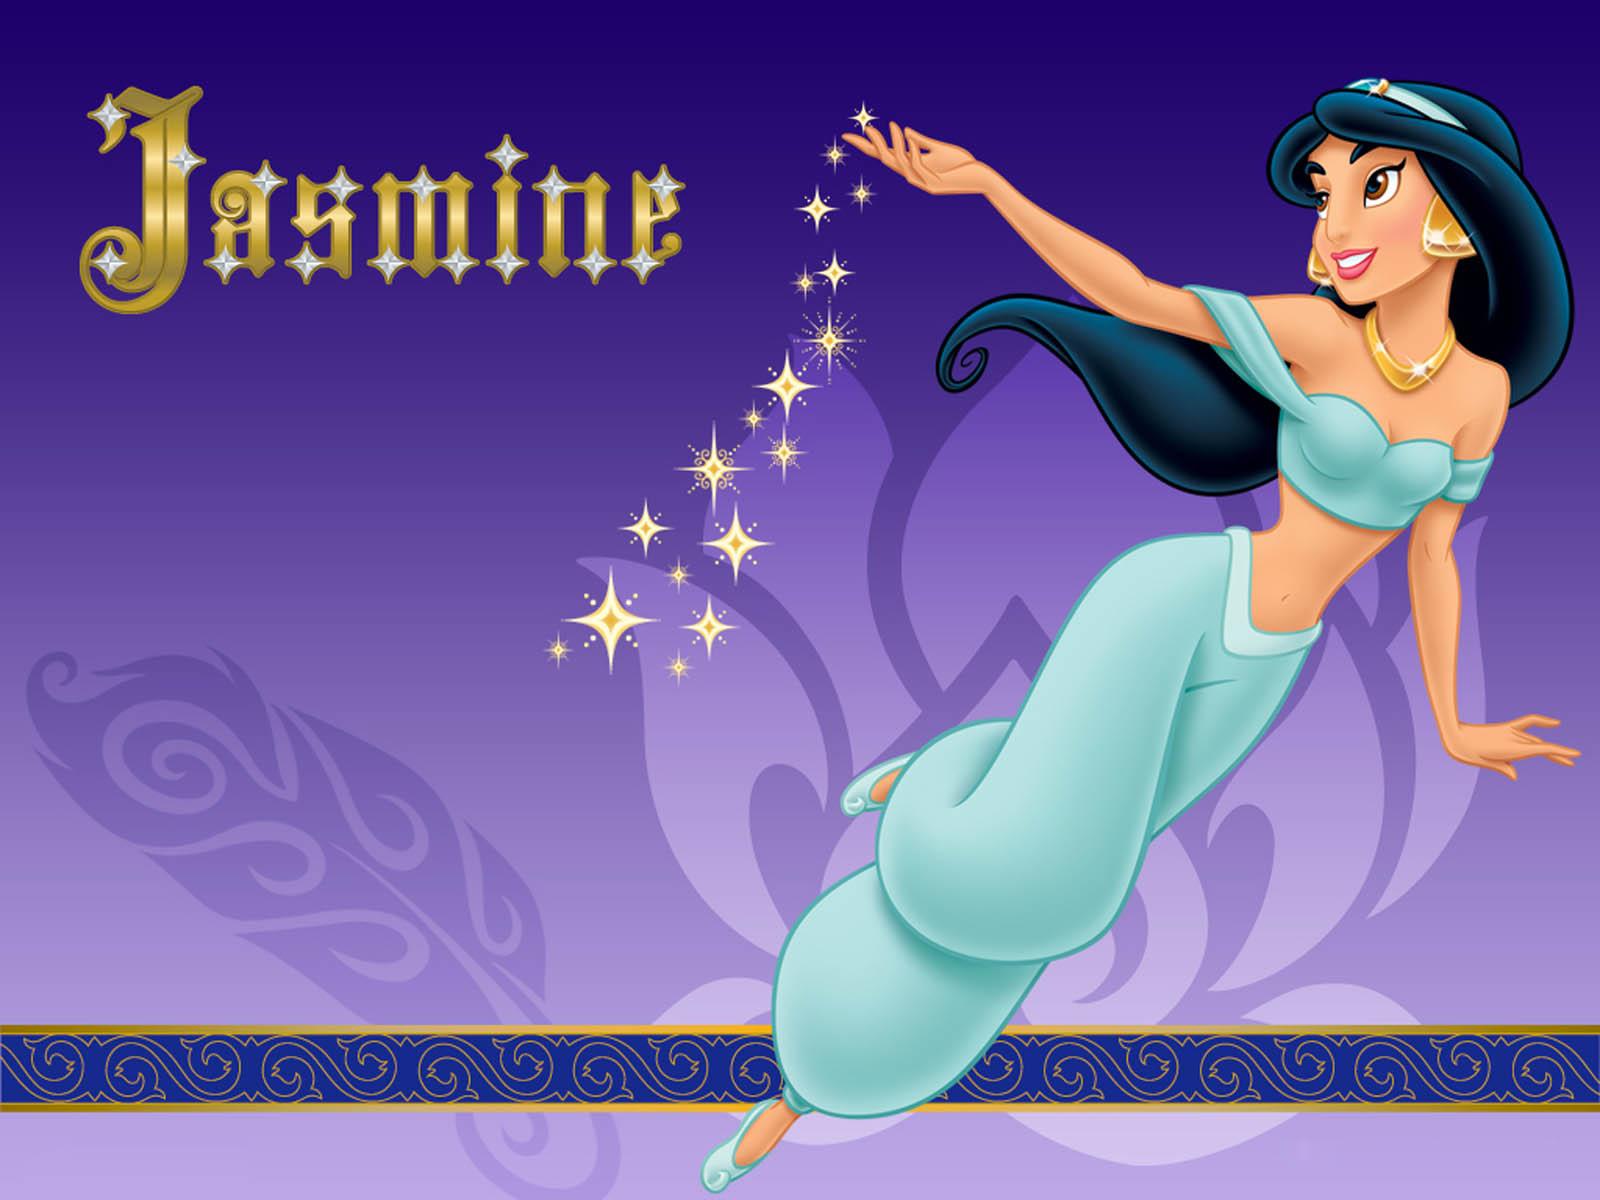 Jasmine: Wallpapers: Disney Princess Jasmine Wallpapers